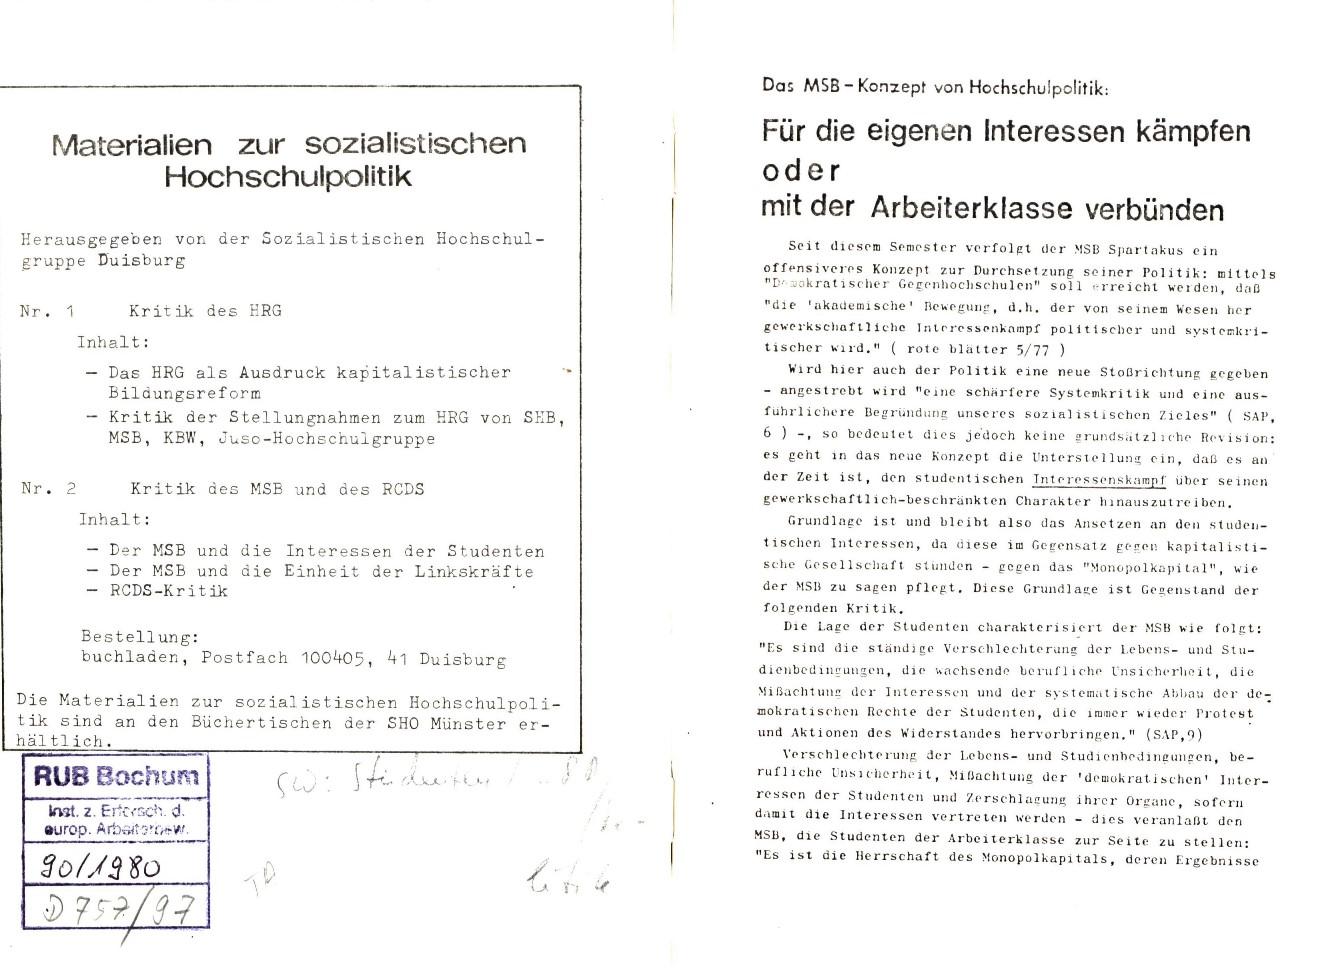 Muenster_SHO_1977_Studenteninteressen_04